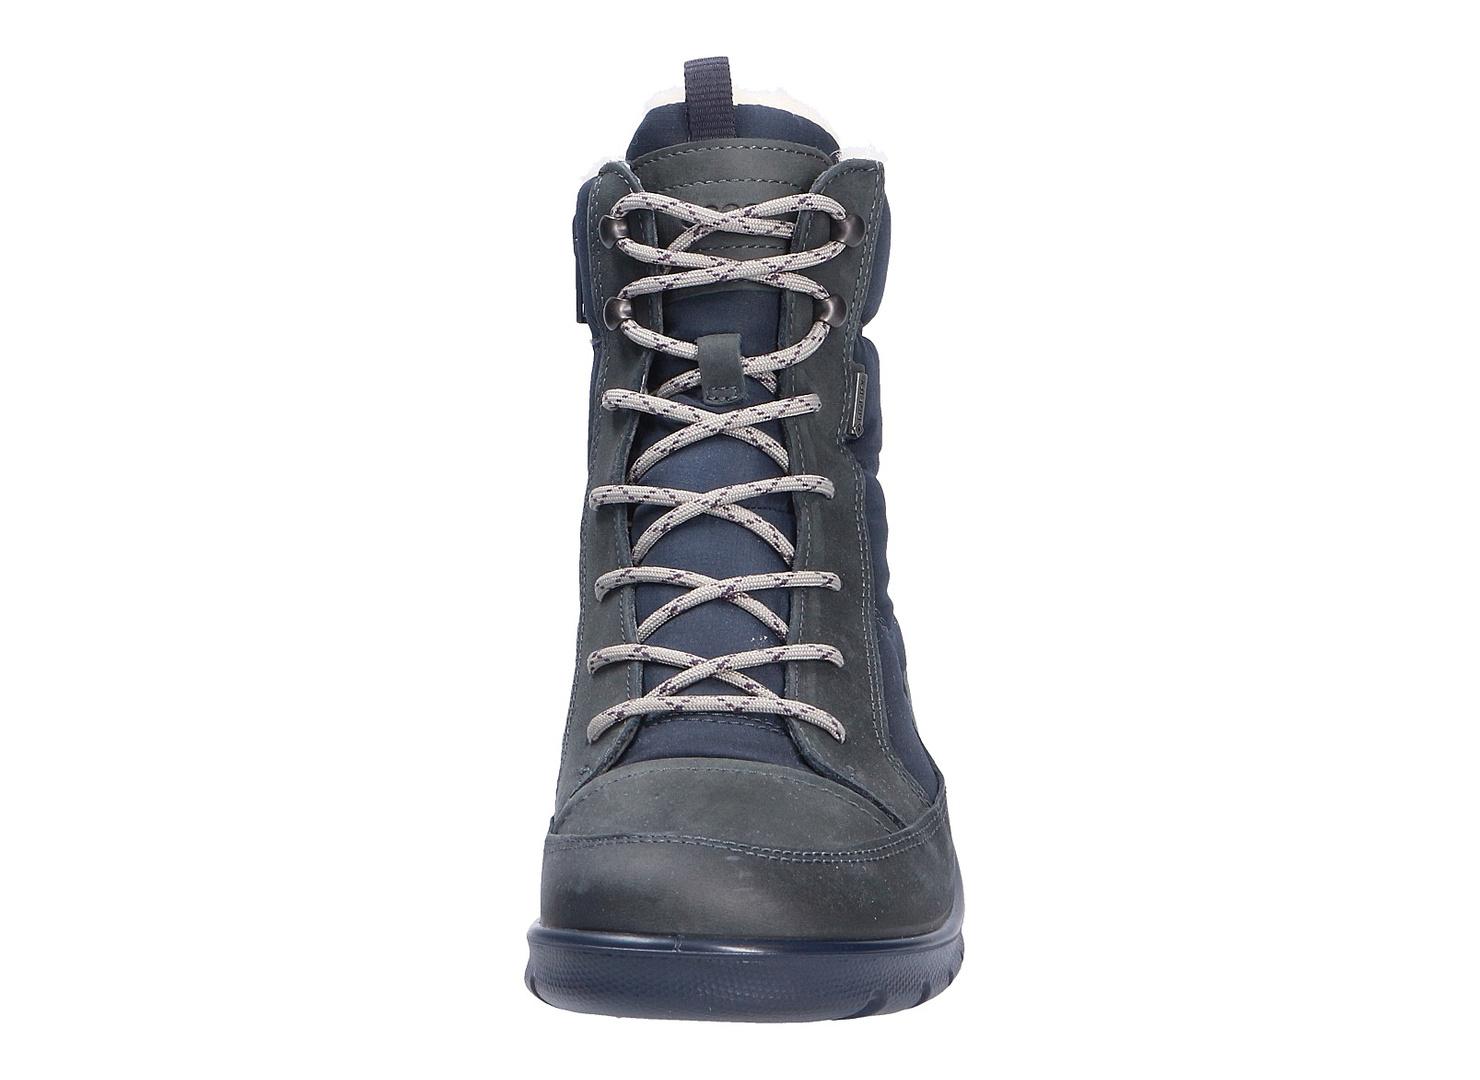 low priced 42c1d 3a0d6 Ecco Damen Stiefel | Winterstiefel | STIEFELETTEN | DAMEN ...